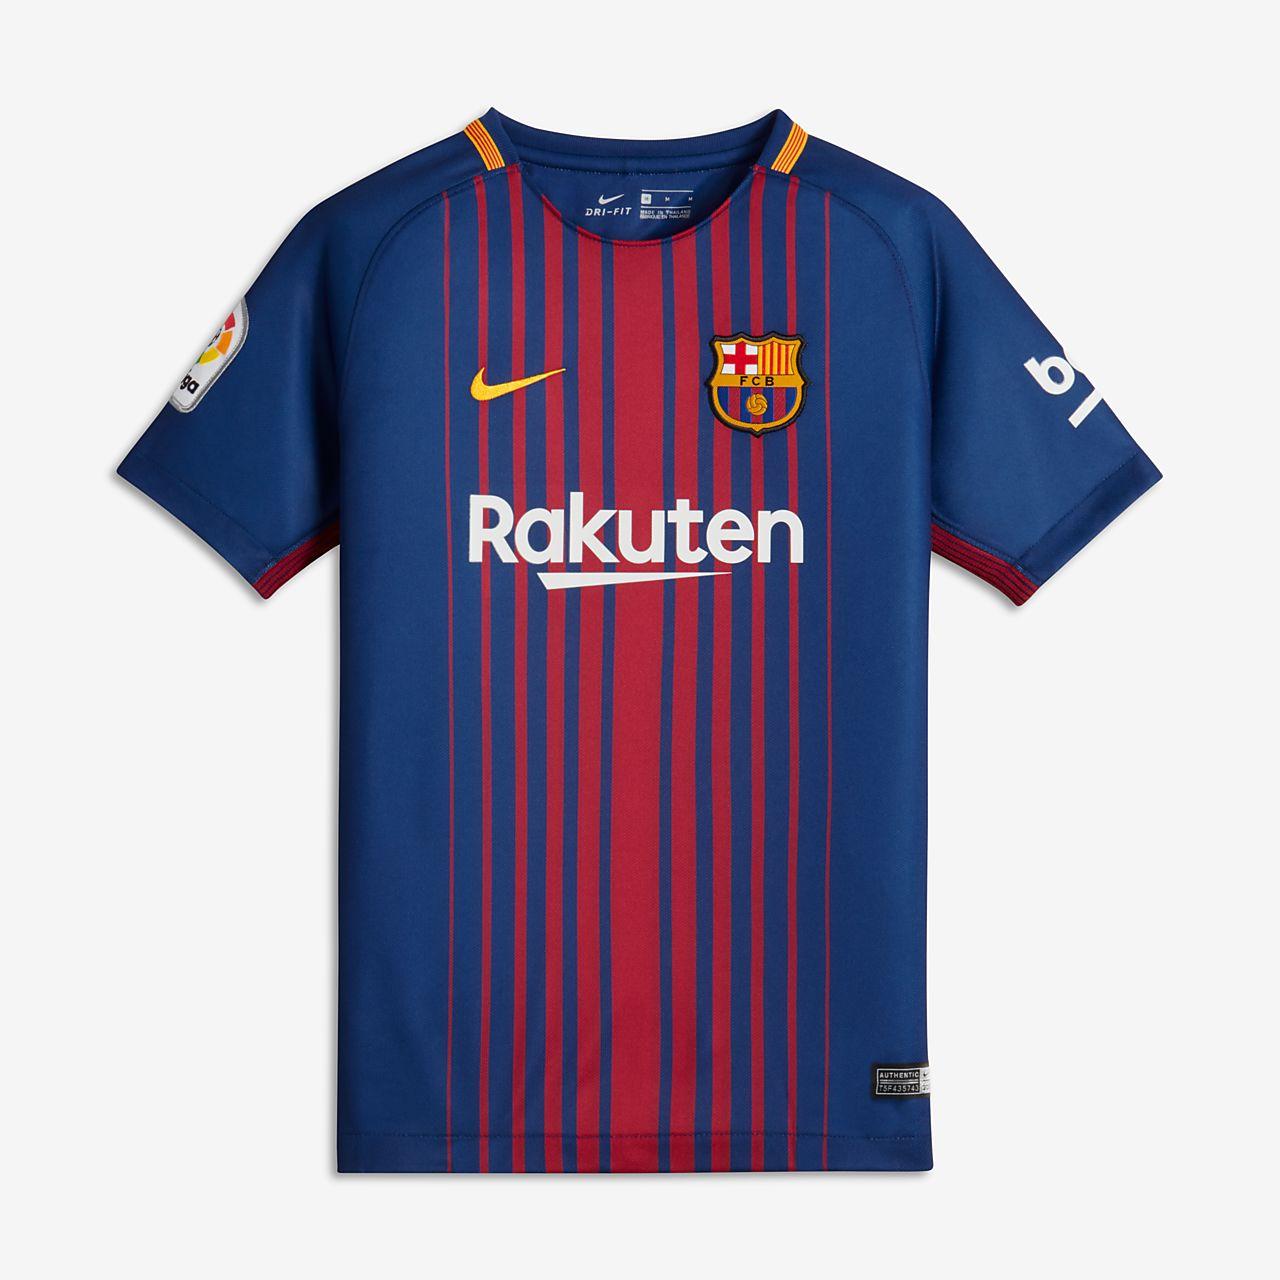 5426a60da3c 2017/18 FC Barcelona Home Older Kids' Football Shirt. Nike.com MY